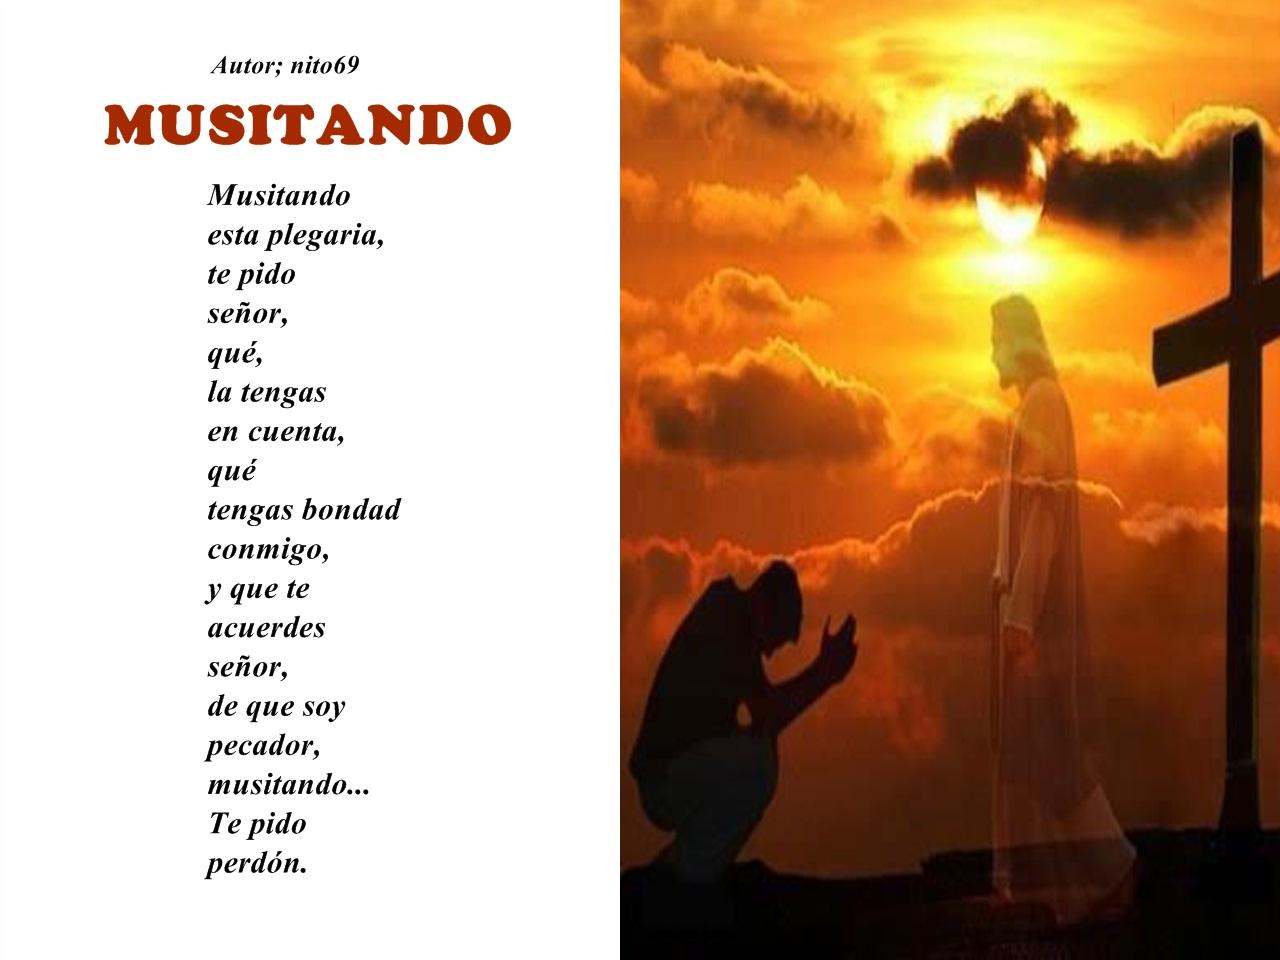 MUSITANDO